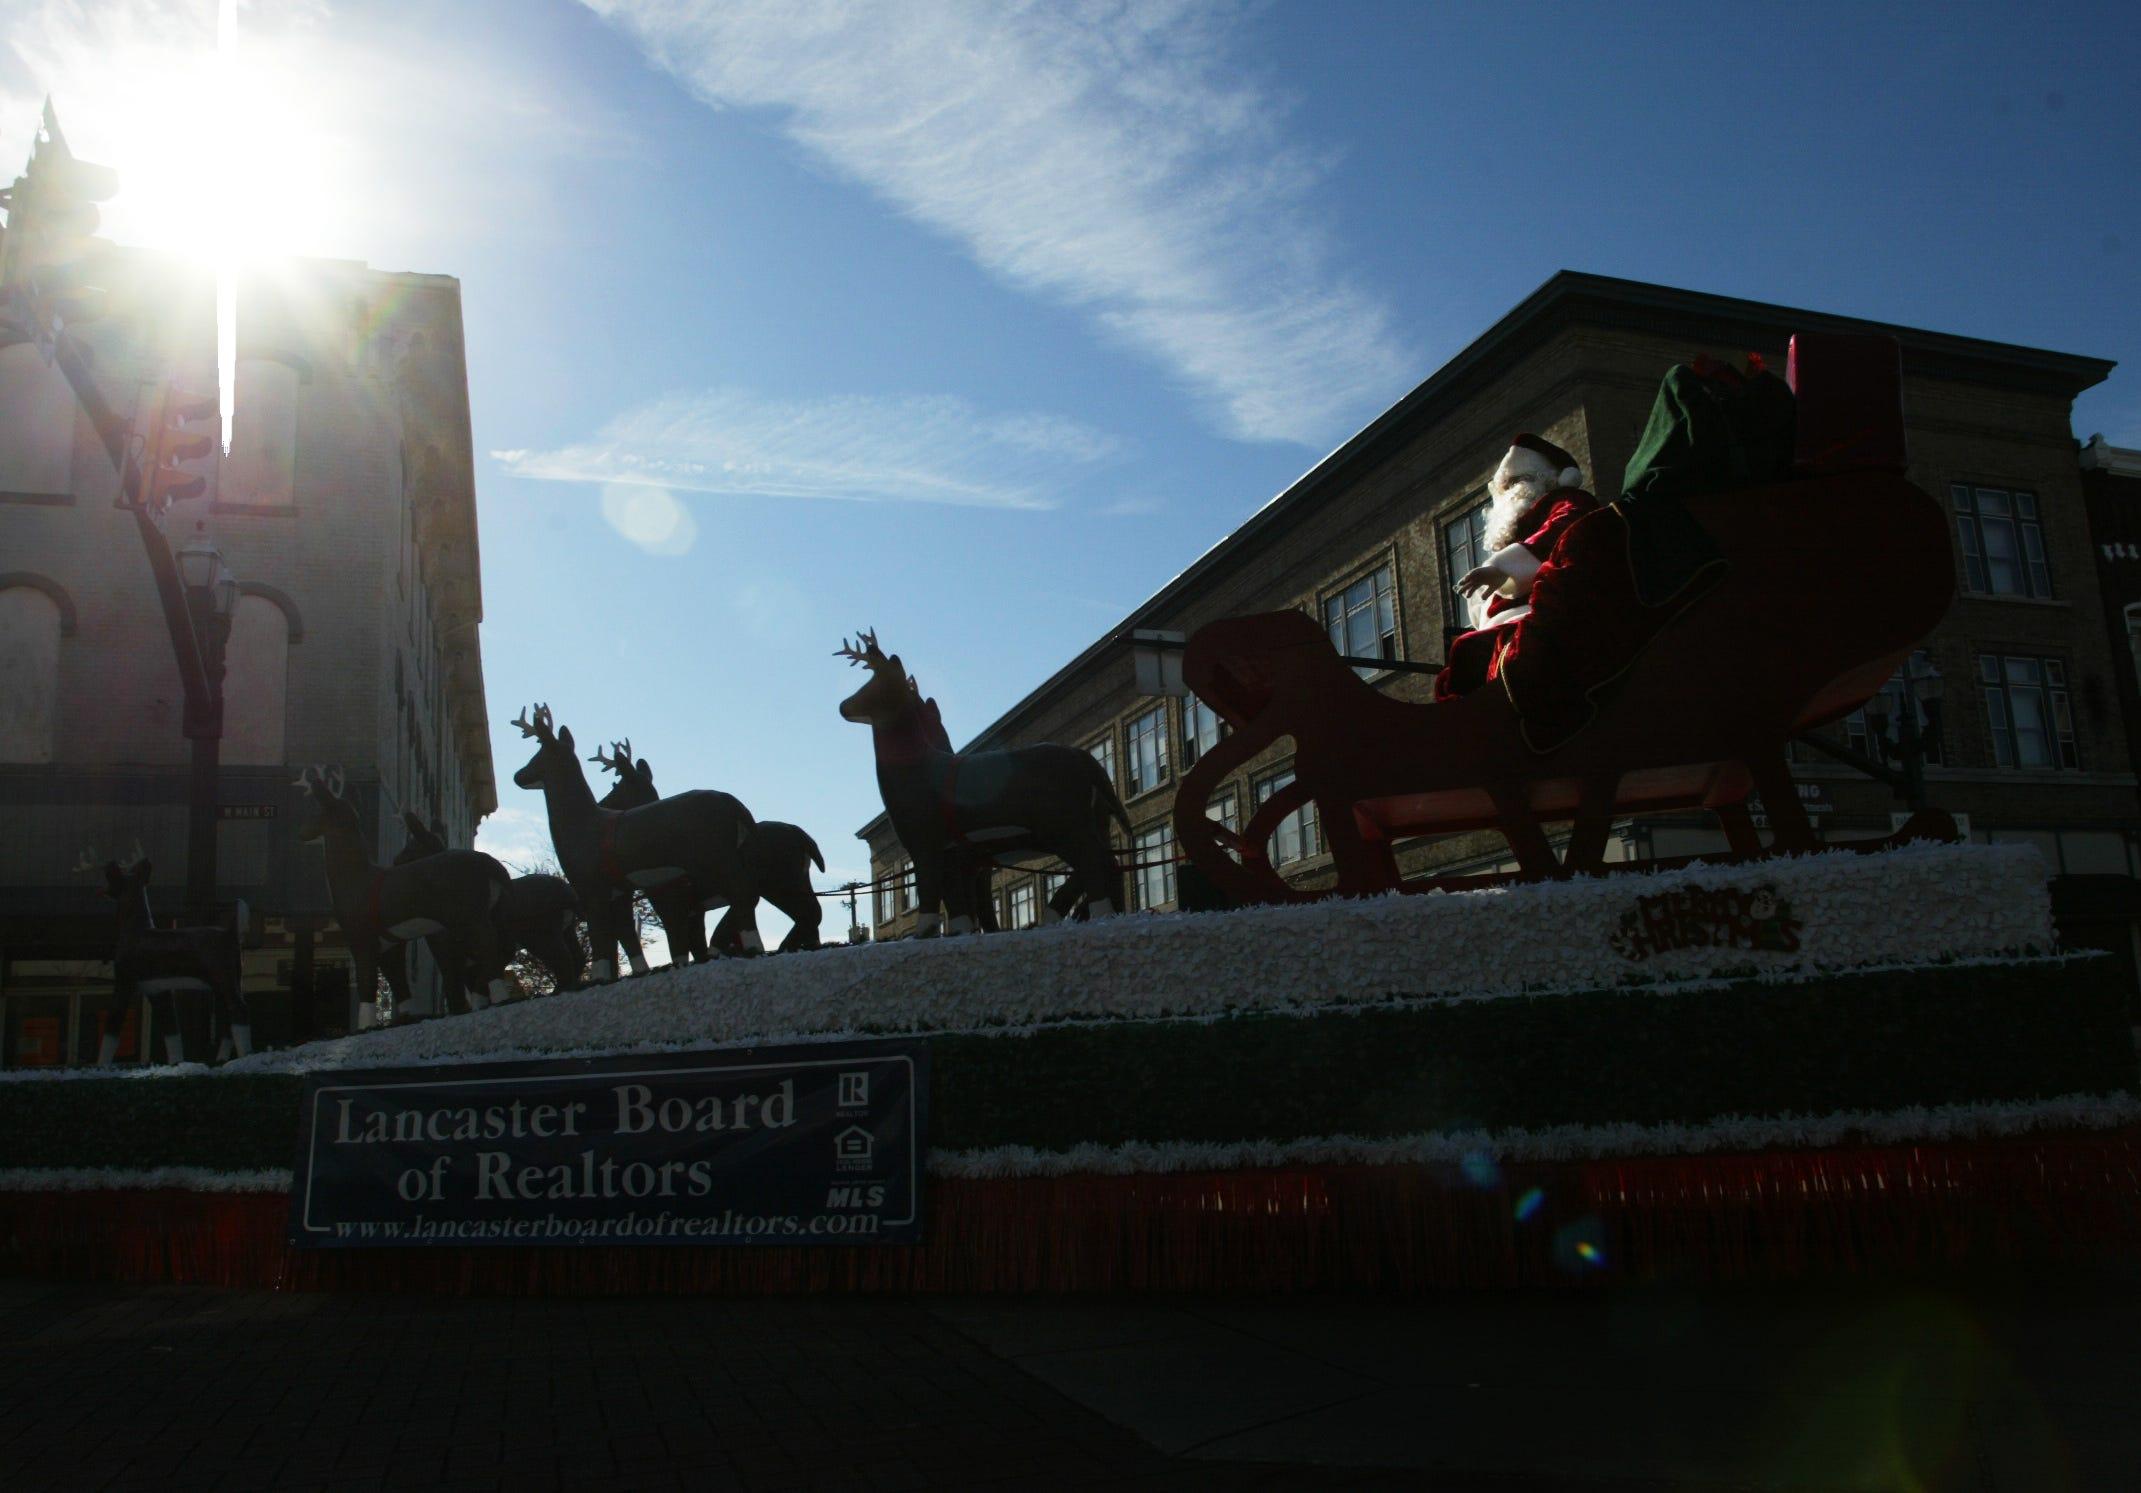 Lancaster holiday parade canceled amid COVID concerns